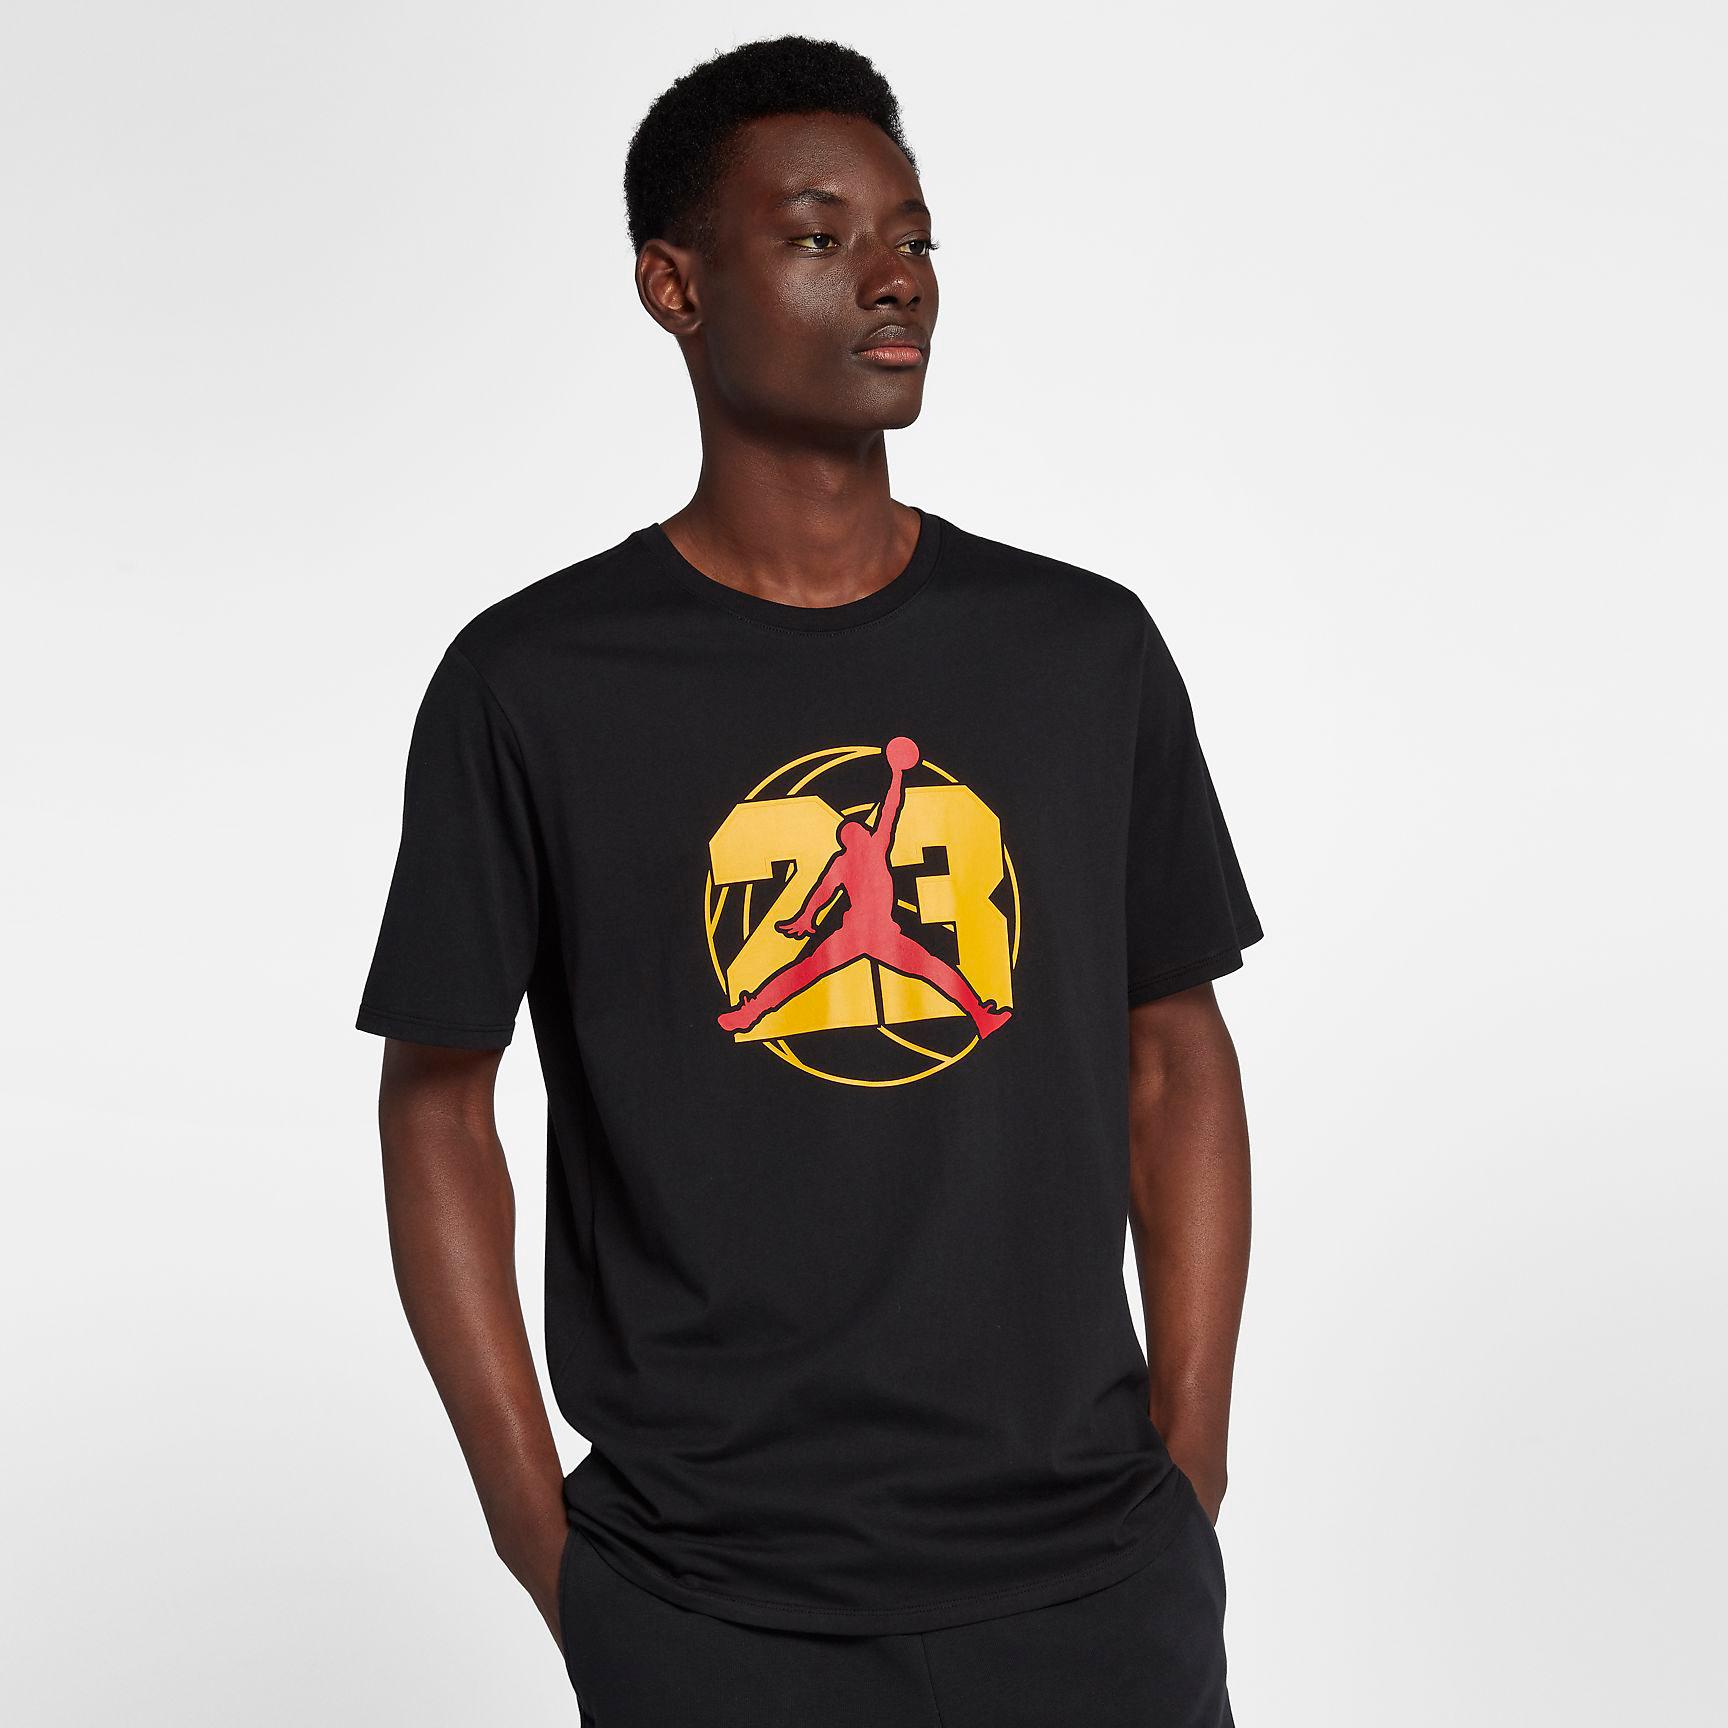 air-jordan-13-he-got-game-t-shirt-17